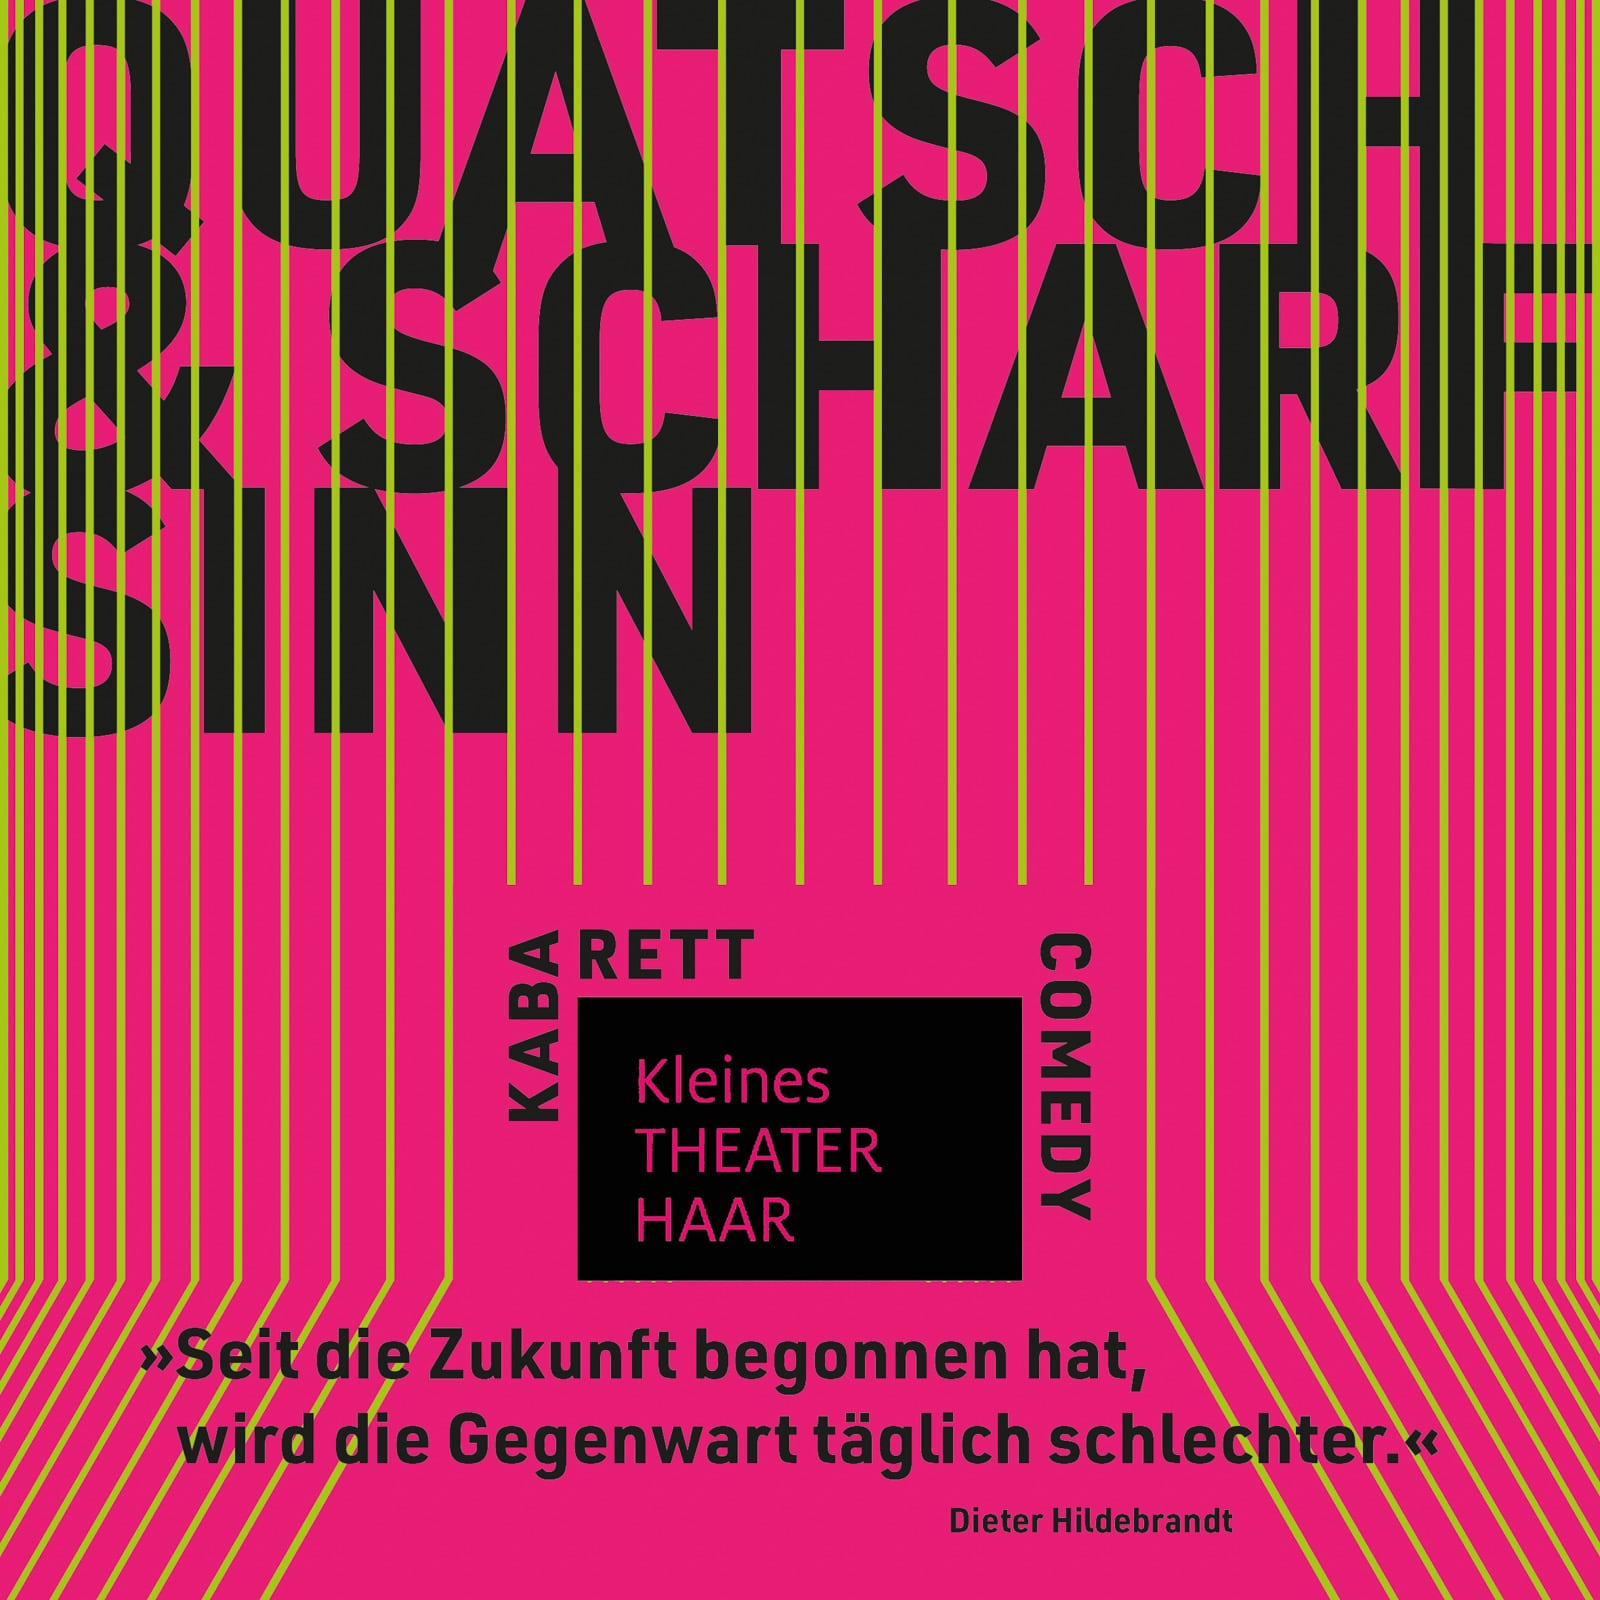 99 Culture Books: Kleines Theater Haar, Plakat 4